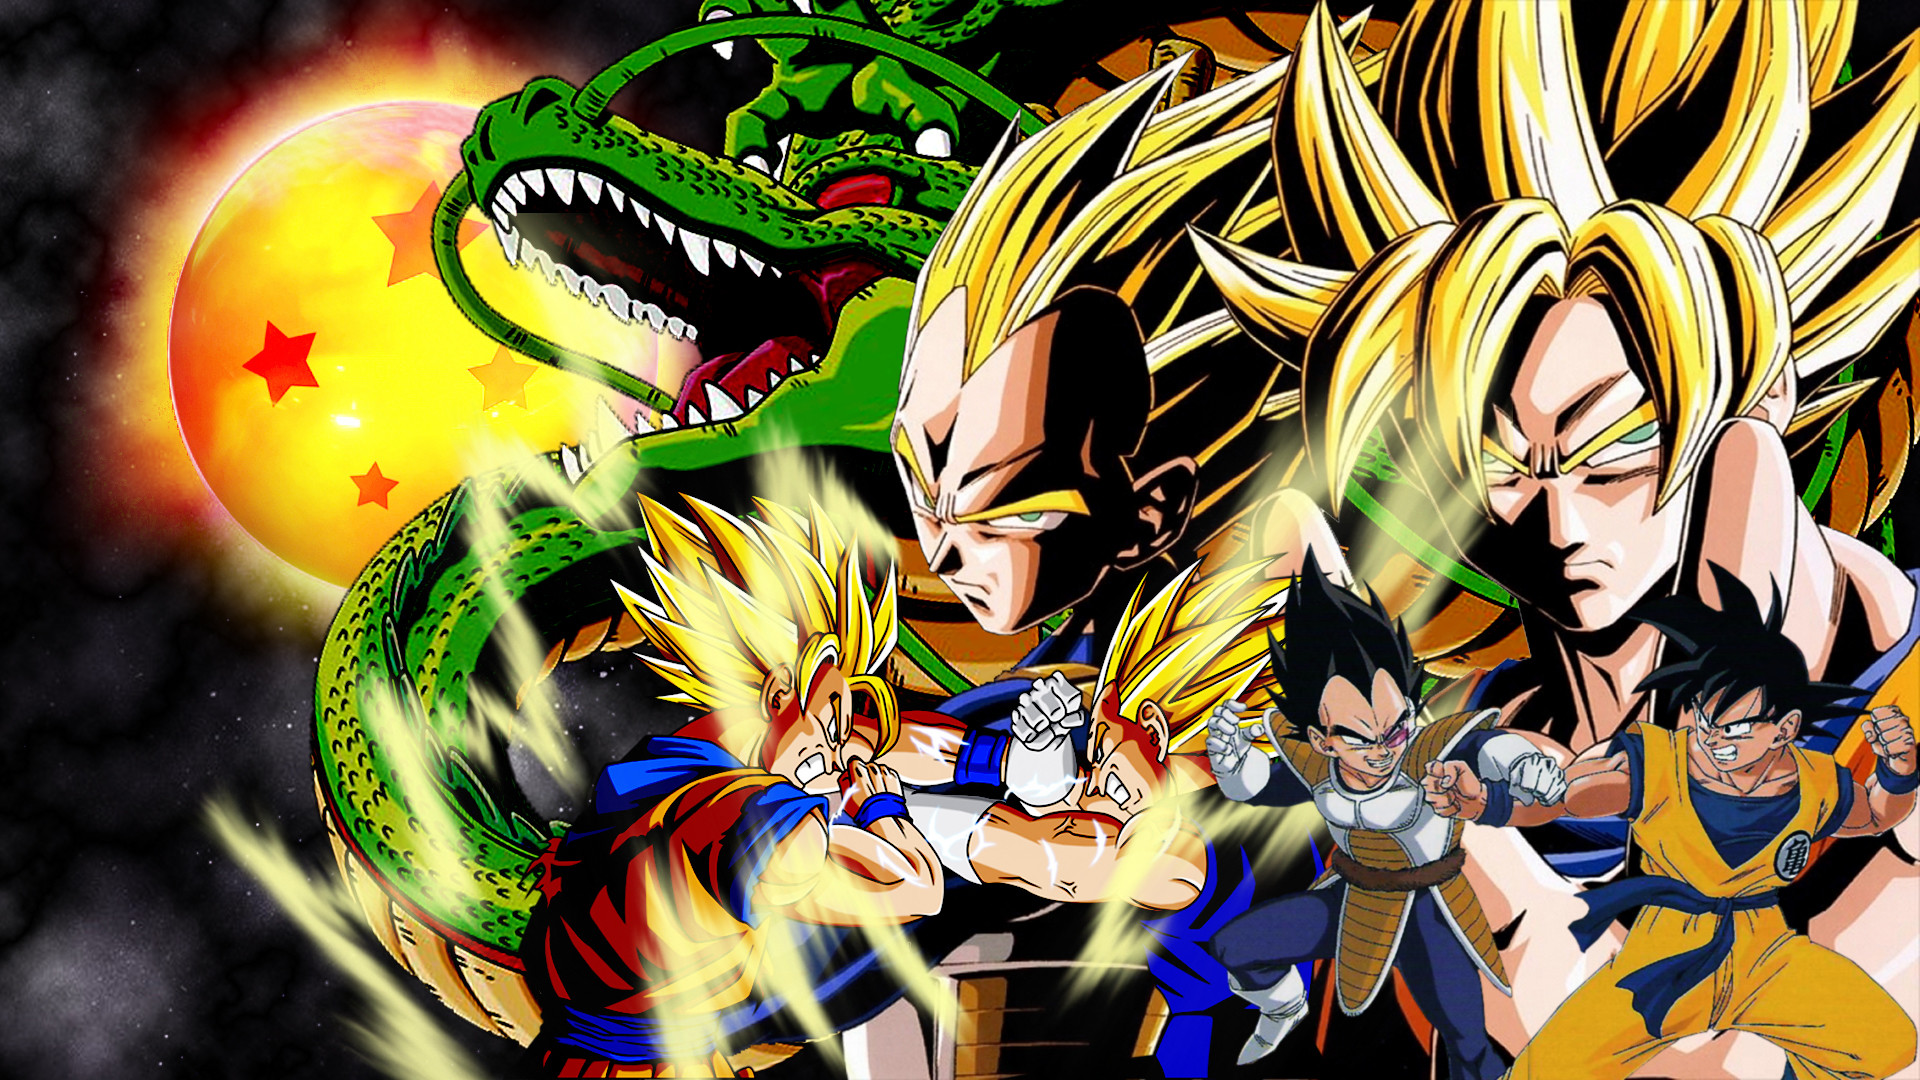 Goku vs vegeta wallpaper